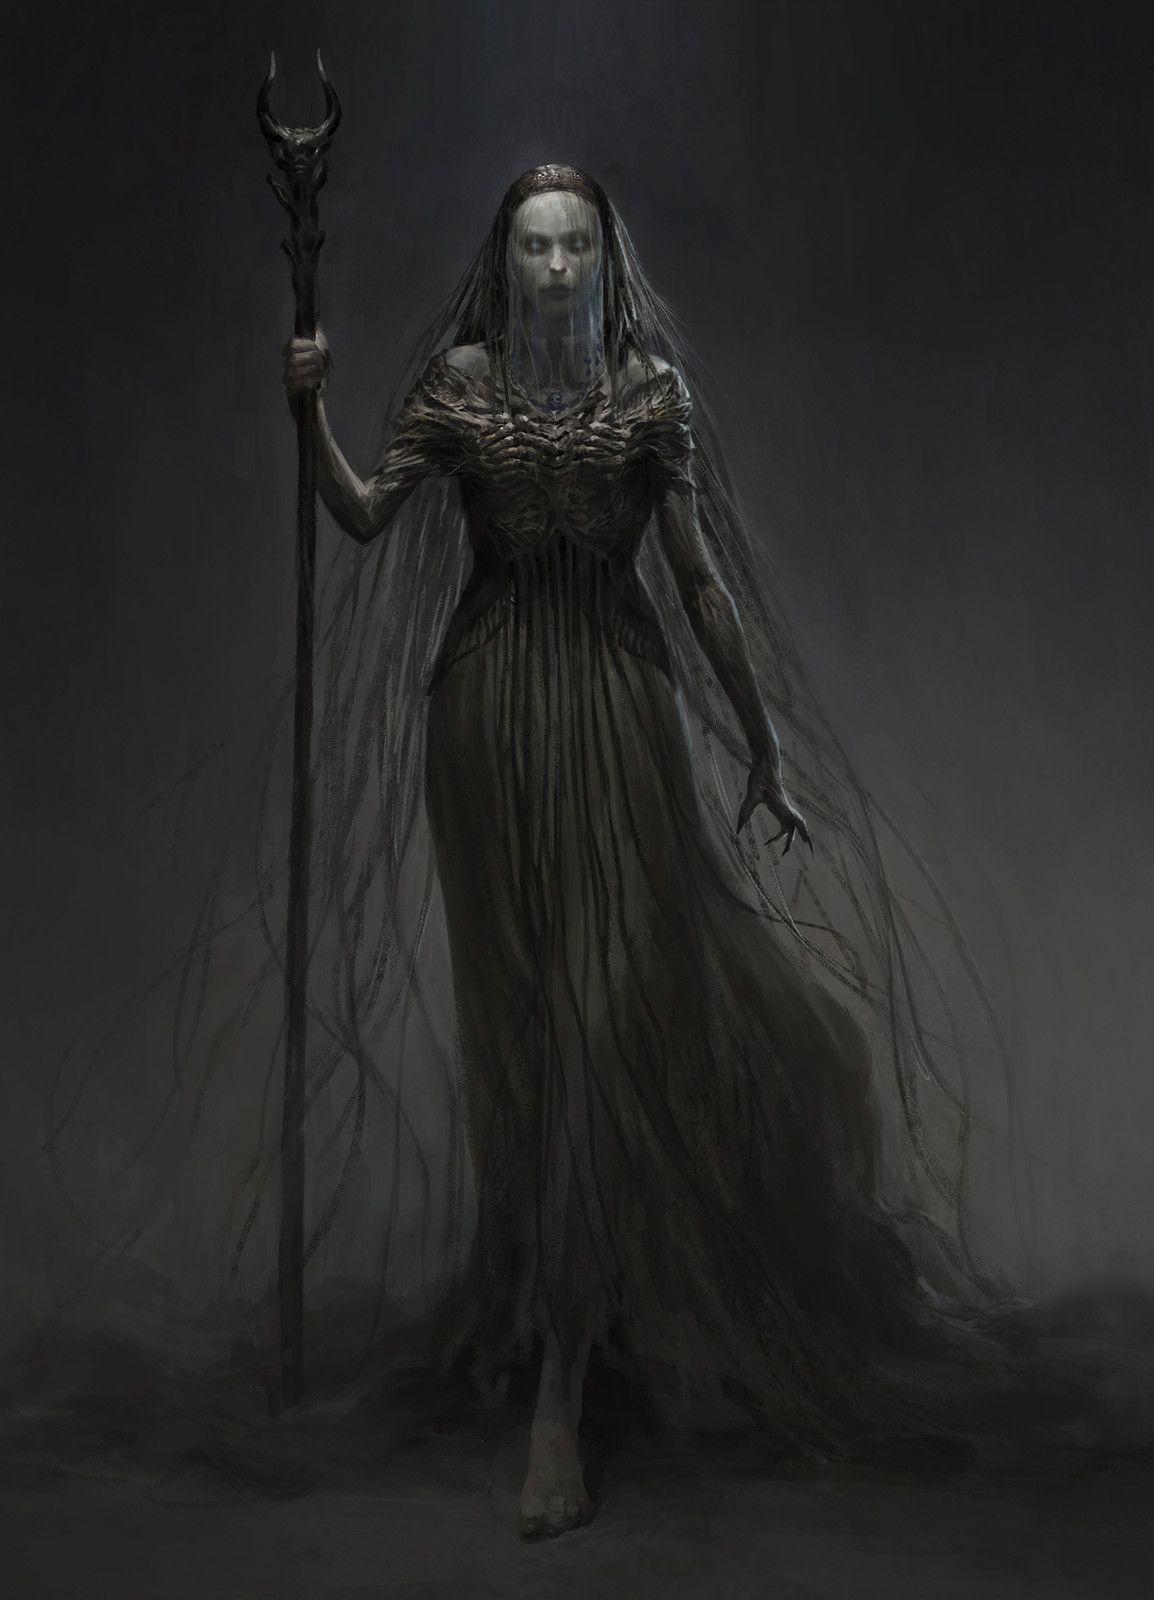 witch, qingkai yang on ArtStation at https://www.artstation.com/artwork/gBgl8